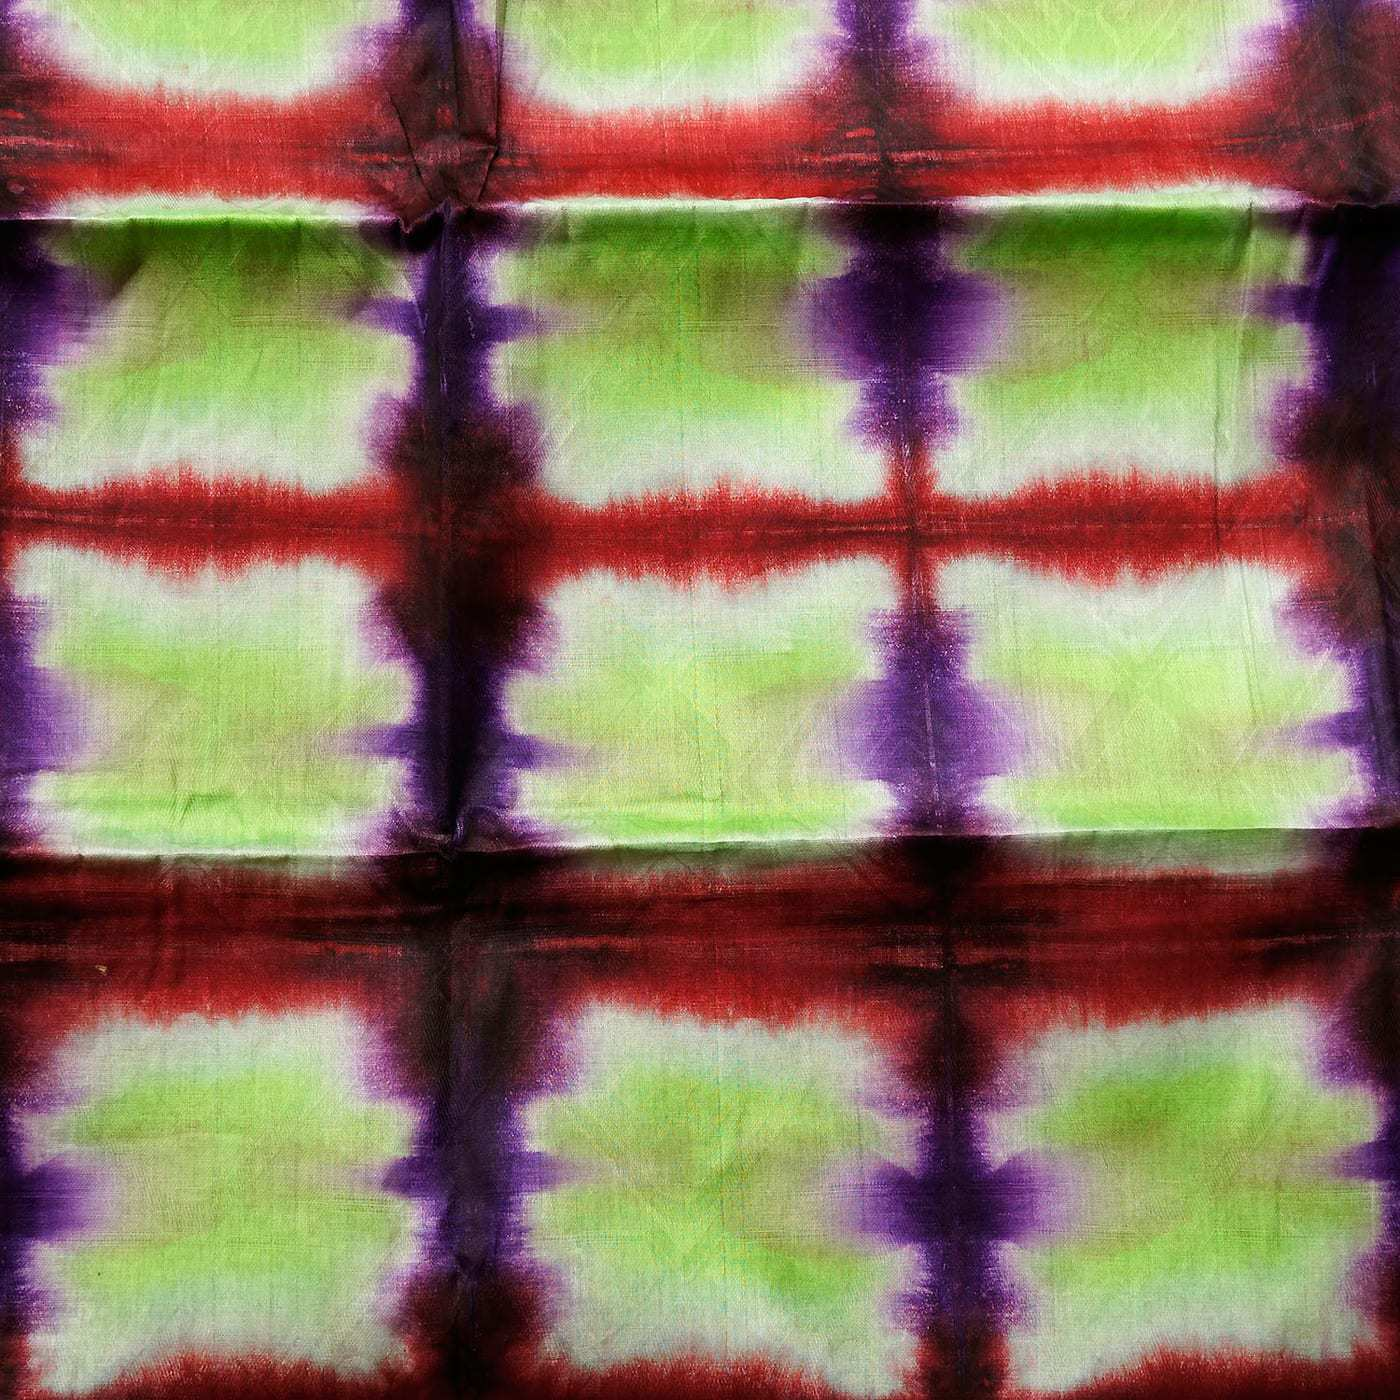 tissu africain en bazin vert anis rouge et violet motif ruche africouleur. Black Bedroom Furniture Sets. Home Design Ideas